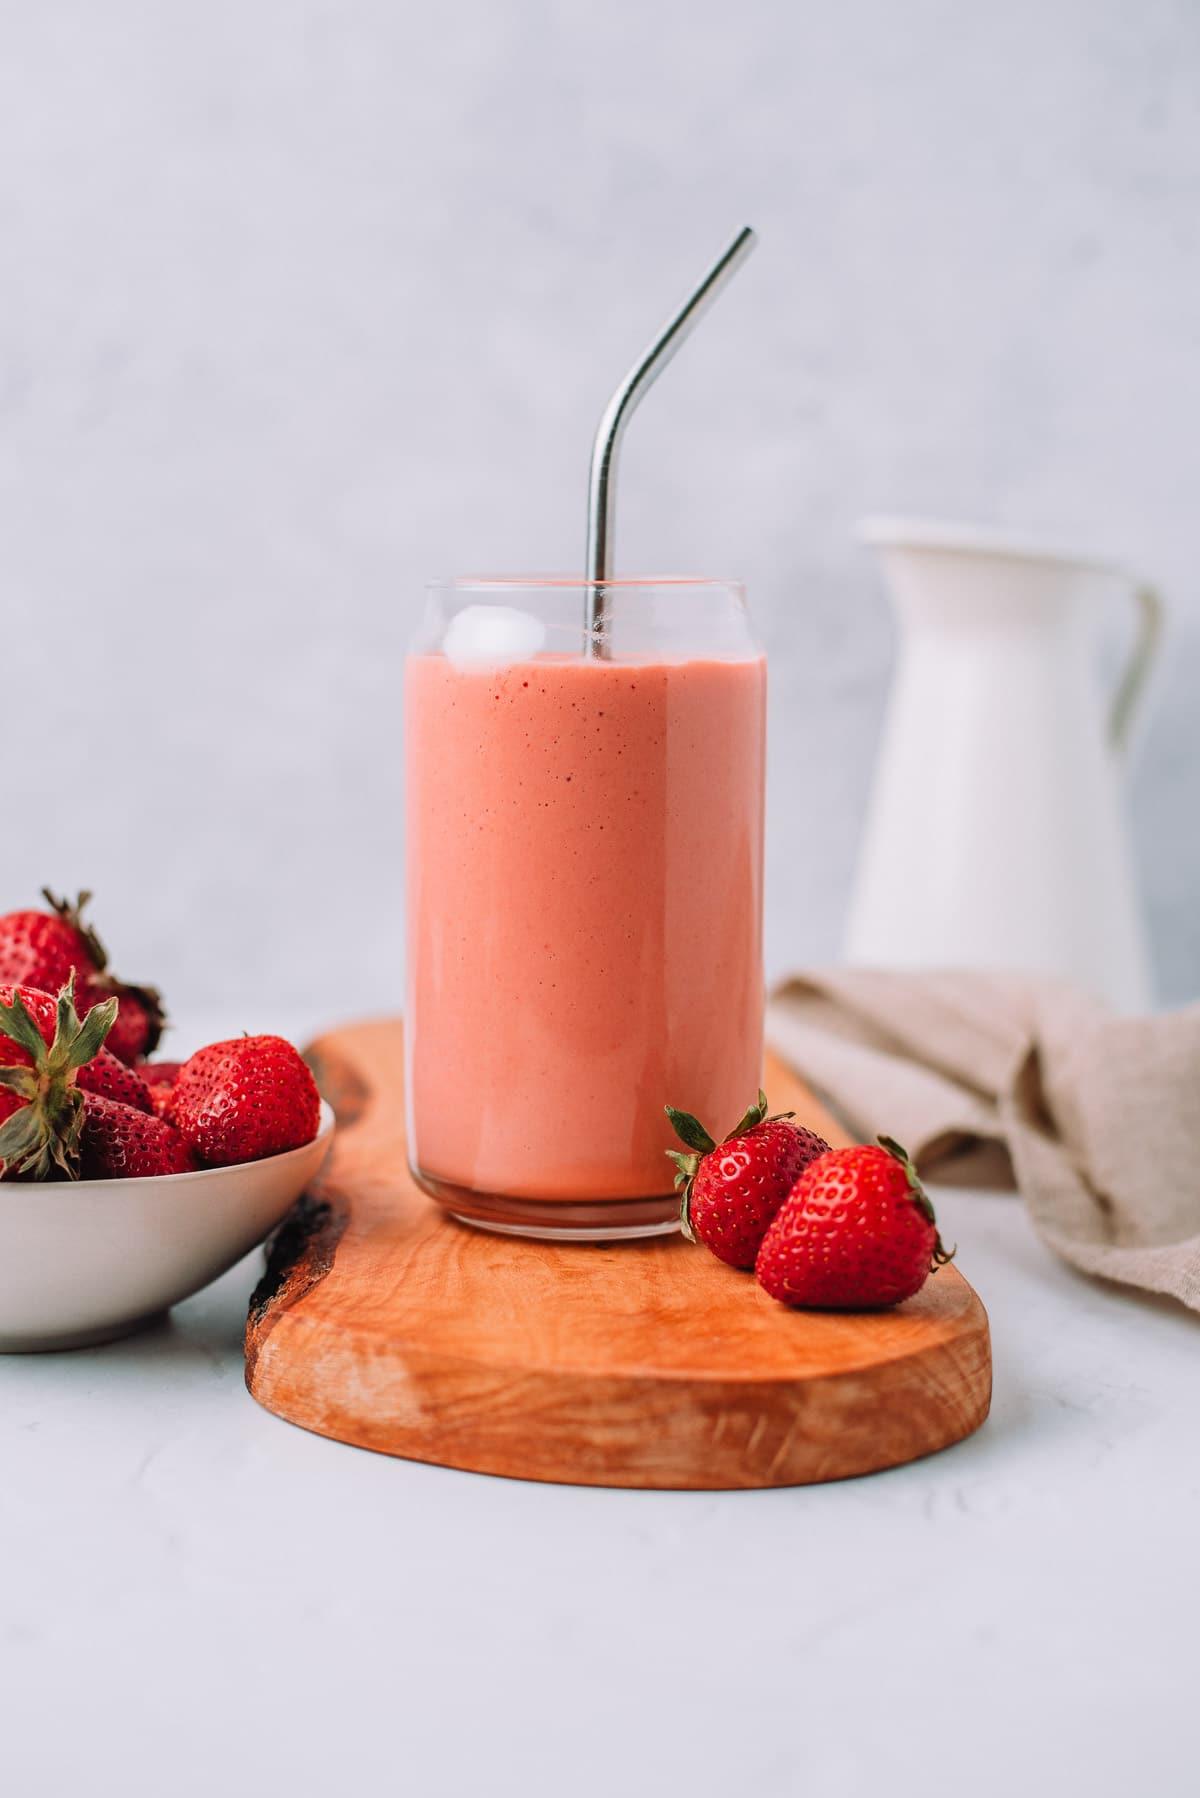 Strawberry Mango Smoothie in jar with metal straw